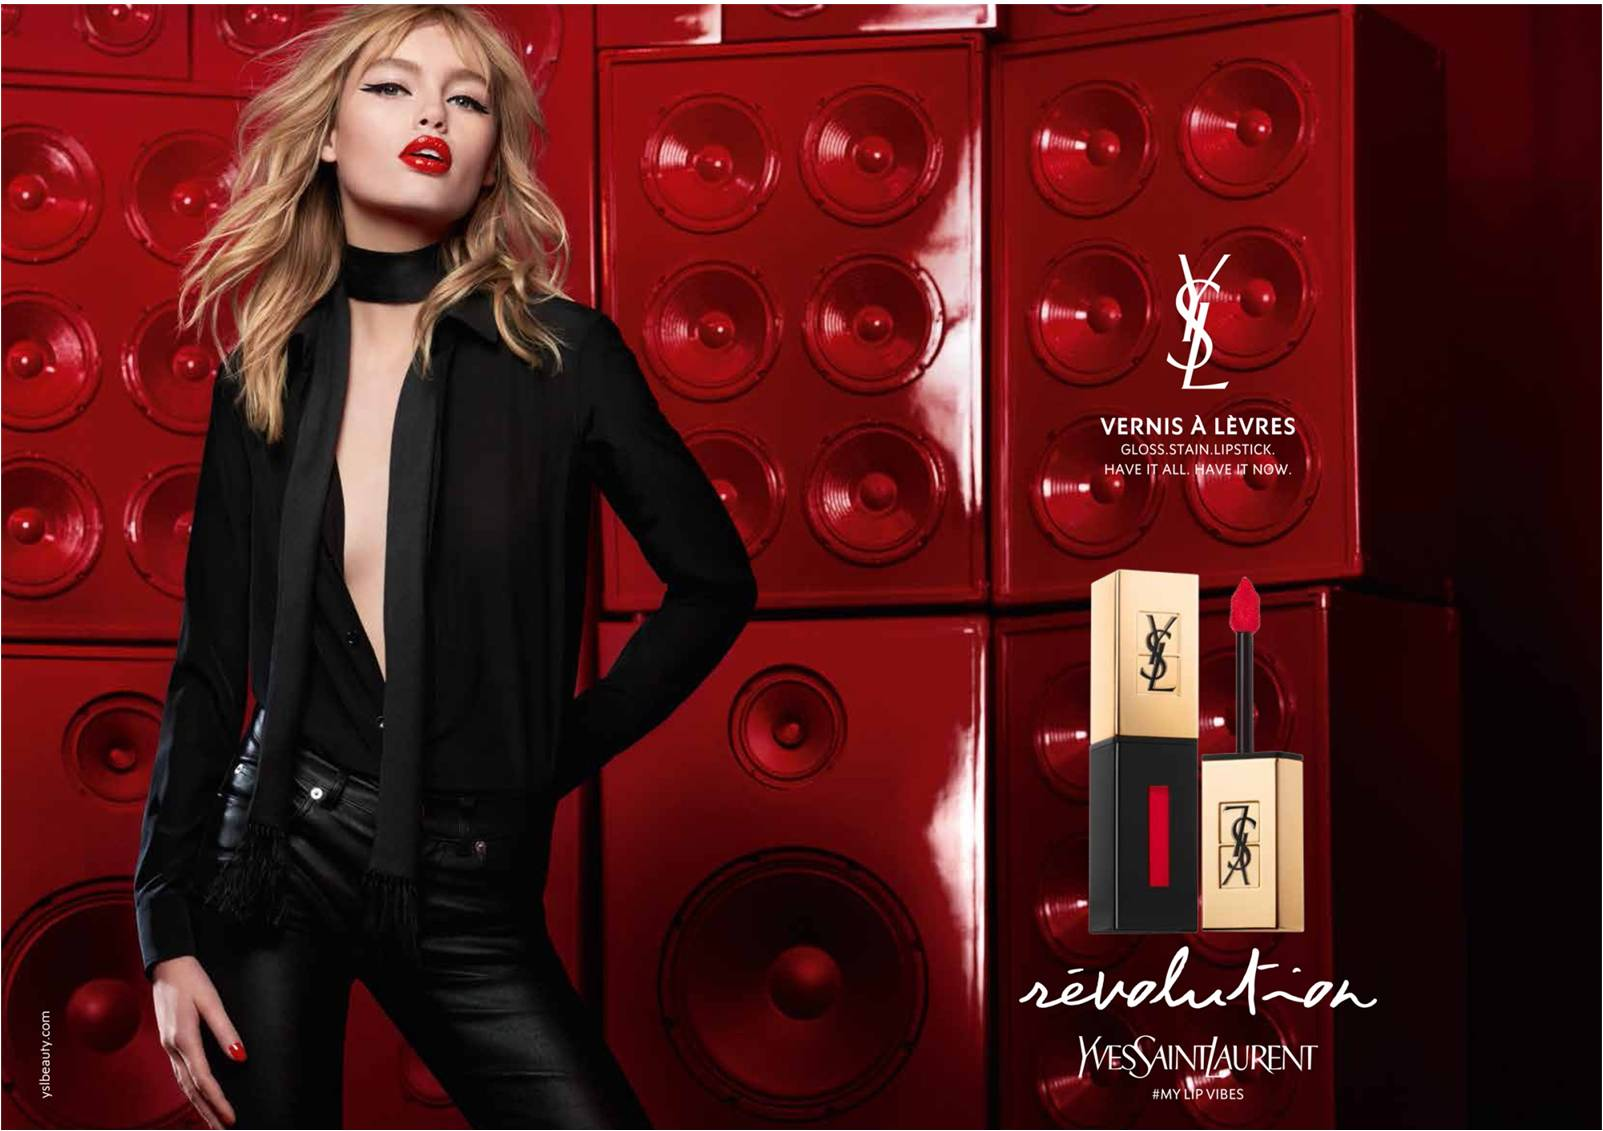 Yves Saint Laurent Vernis 224 L 232 Vres 2017 News Beautyalmanac